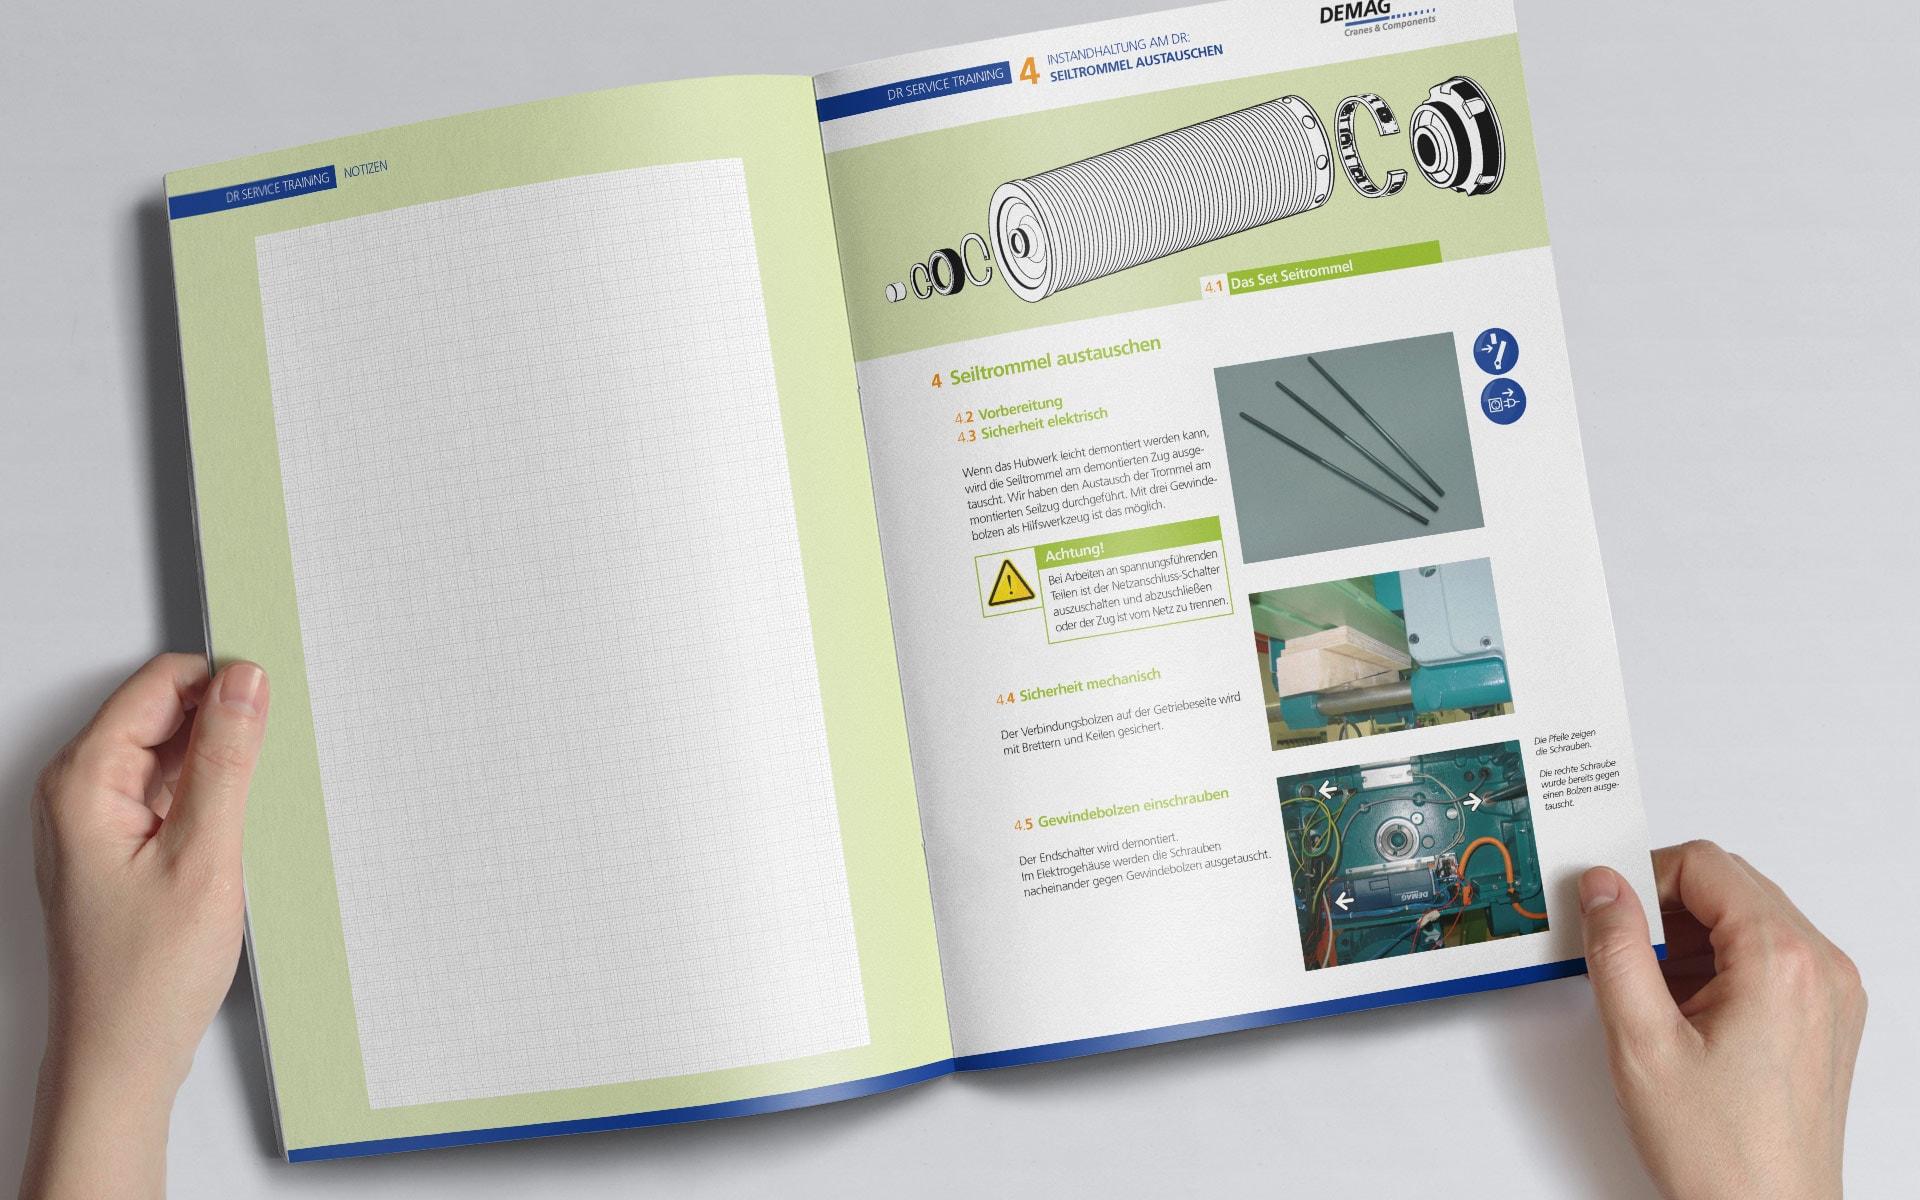 Doppelseite Fehleranalyse Seiltrommel Diagnosehandbuch Demag Troubleshooting